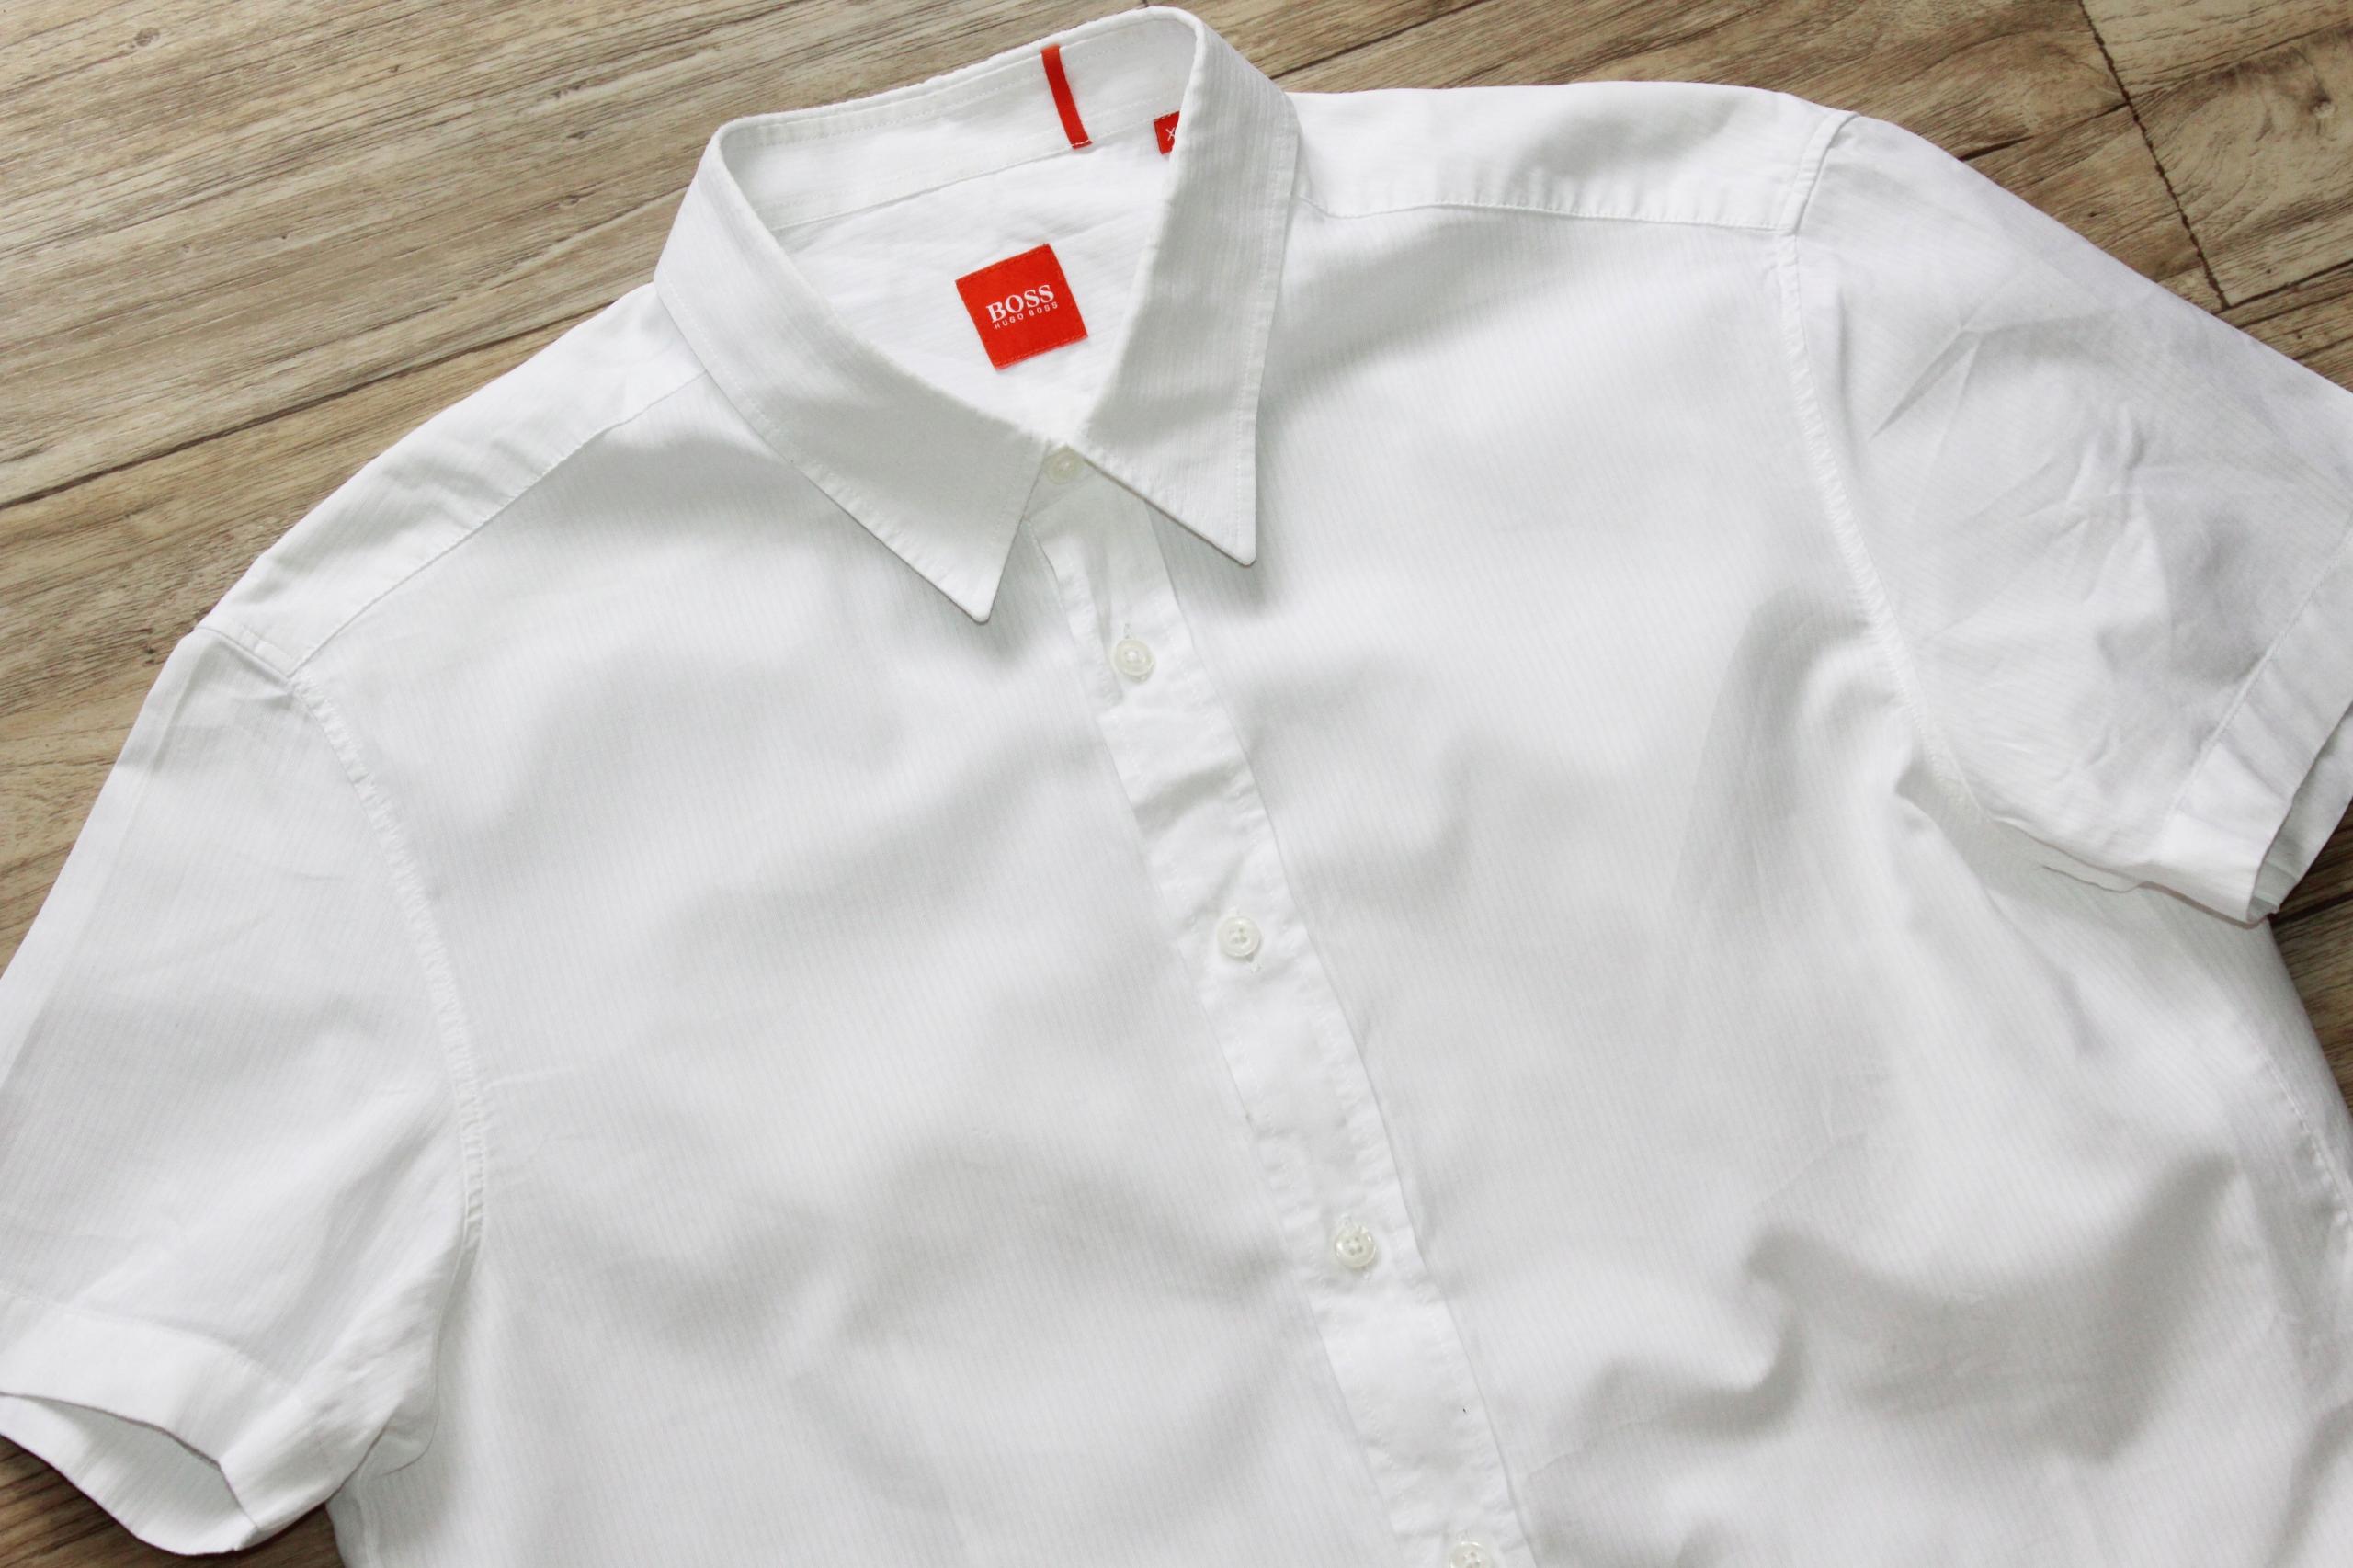 Koszula Hugo Boss Orange biała logo męska bdb L XL